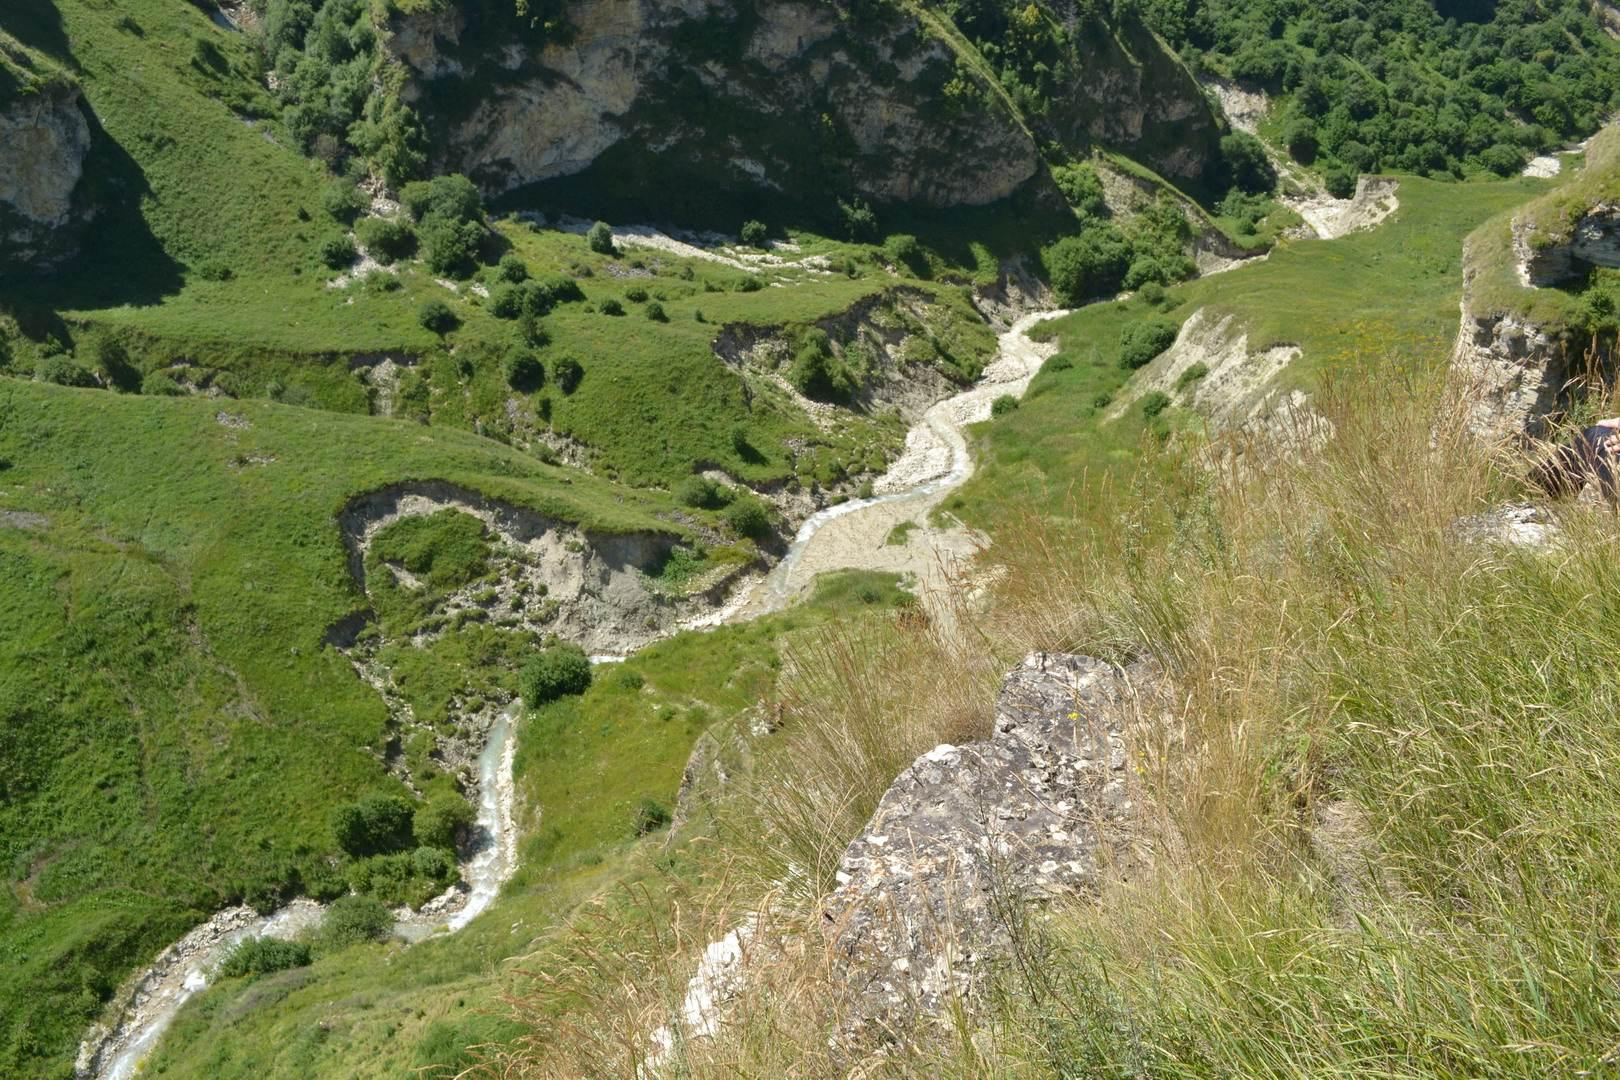 чечня, горы кавказа, ущелье, река